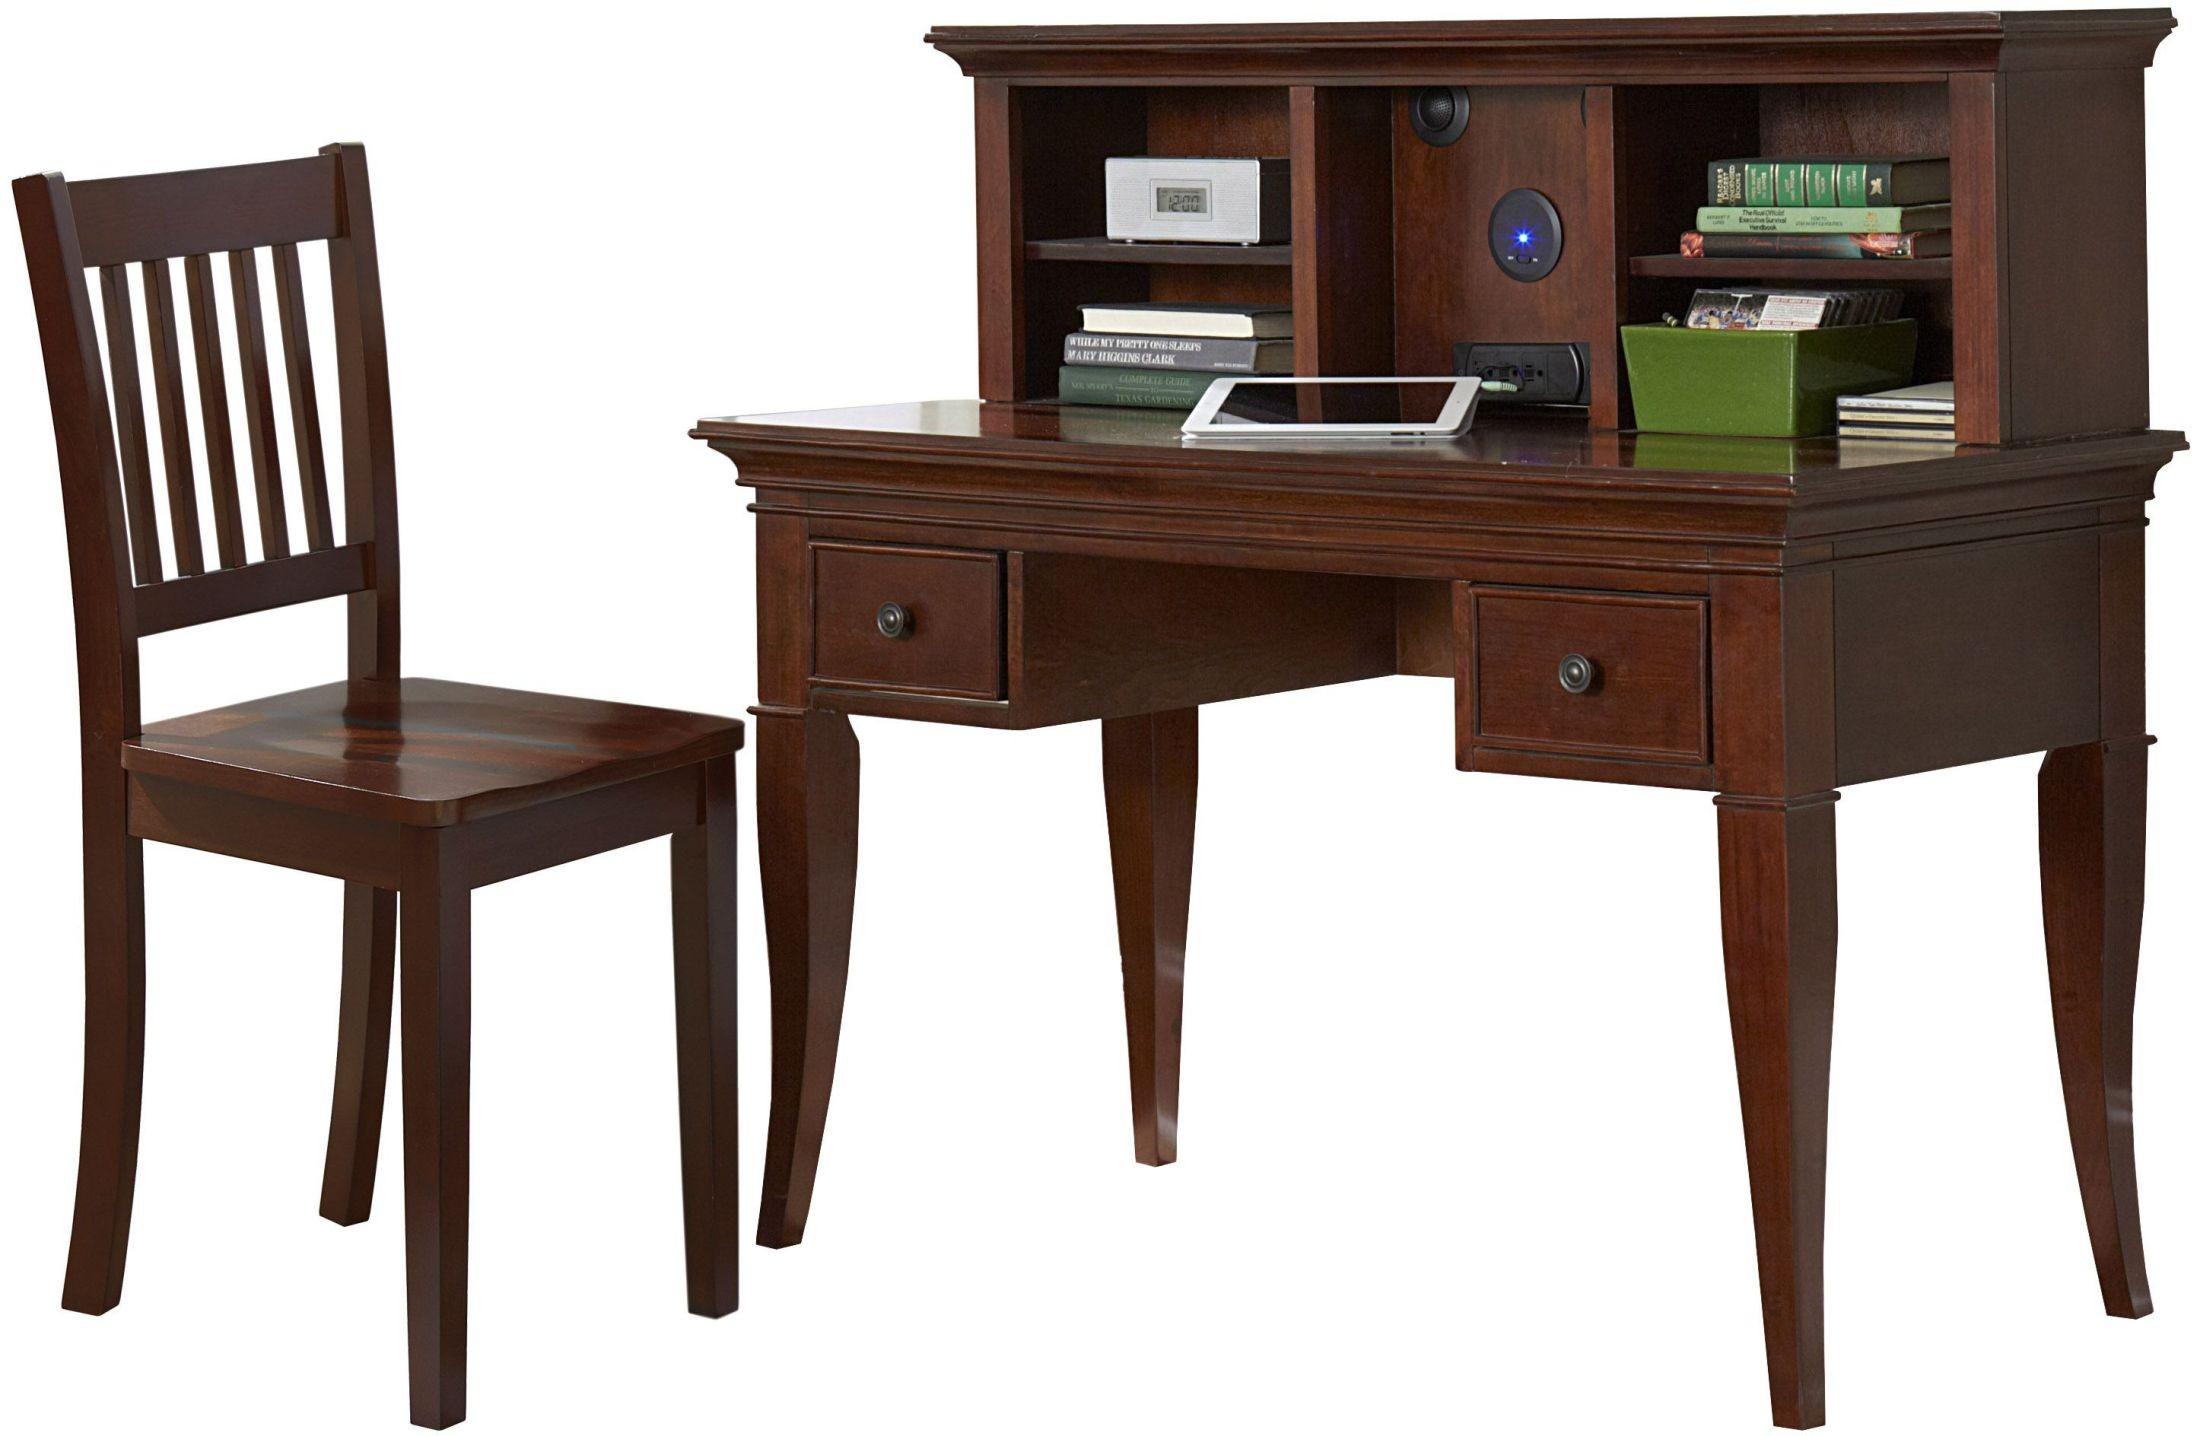 desk with chair office ottawa walnut street chestnut and hutch from ne